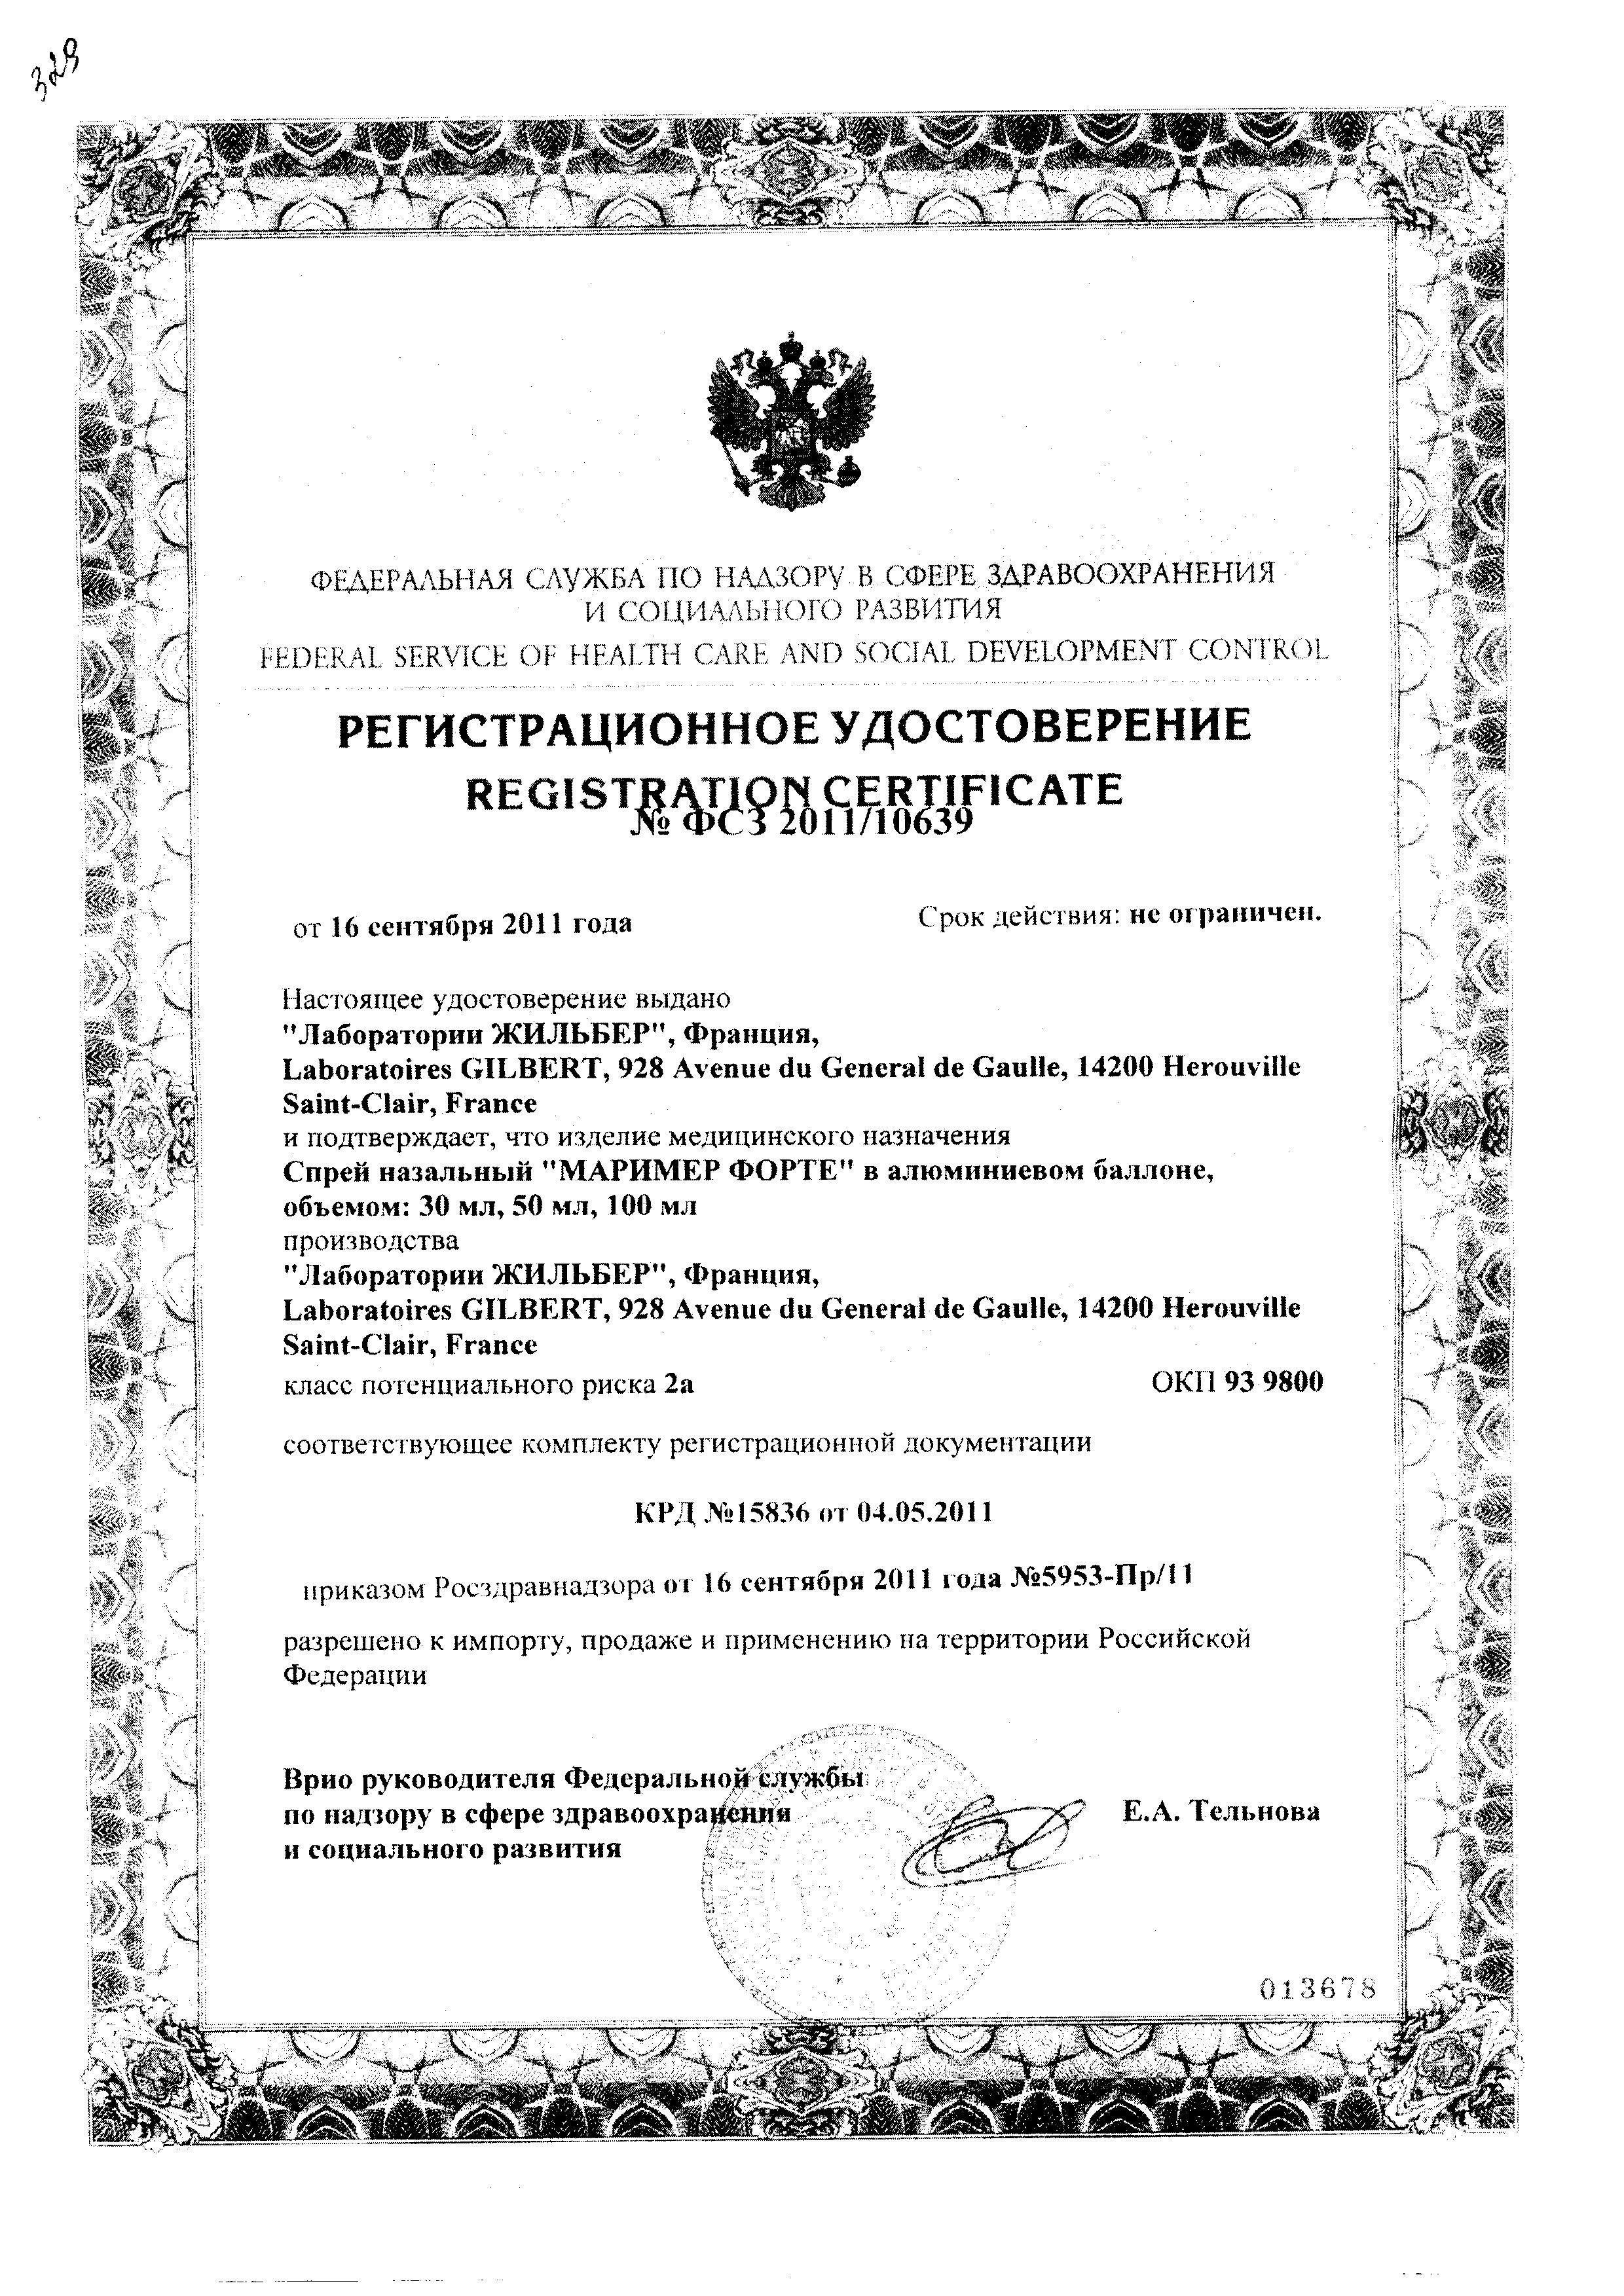 Маример Форте сертификат